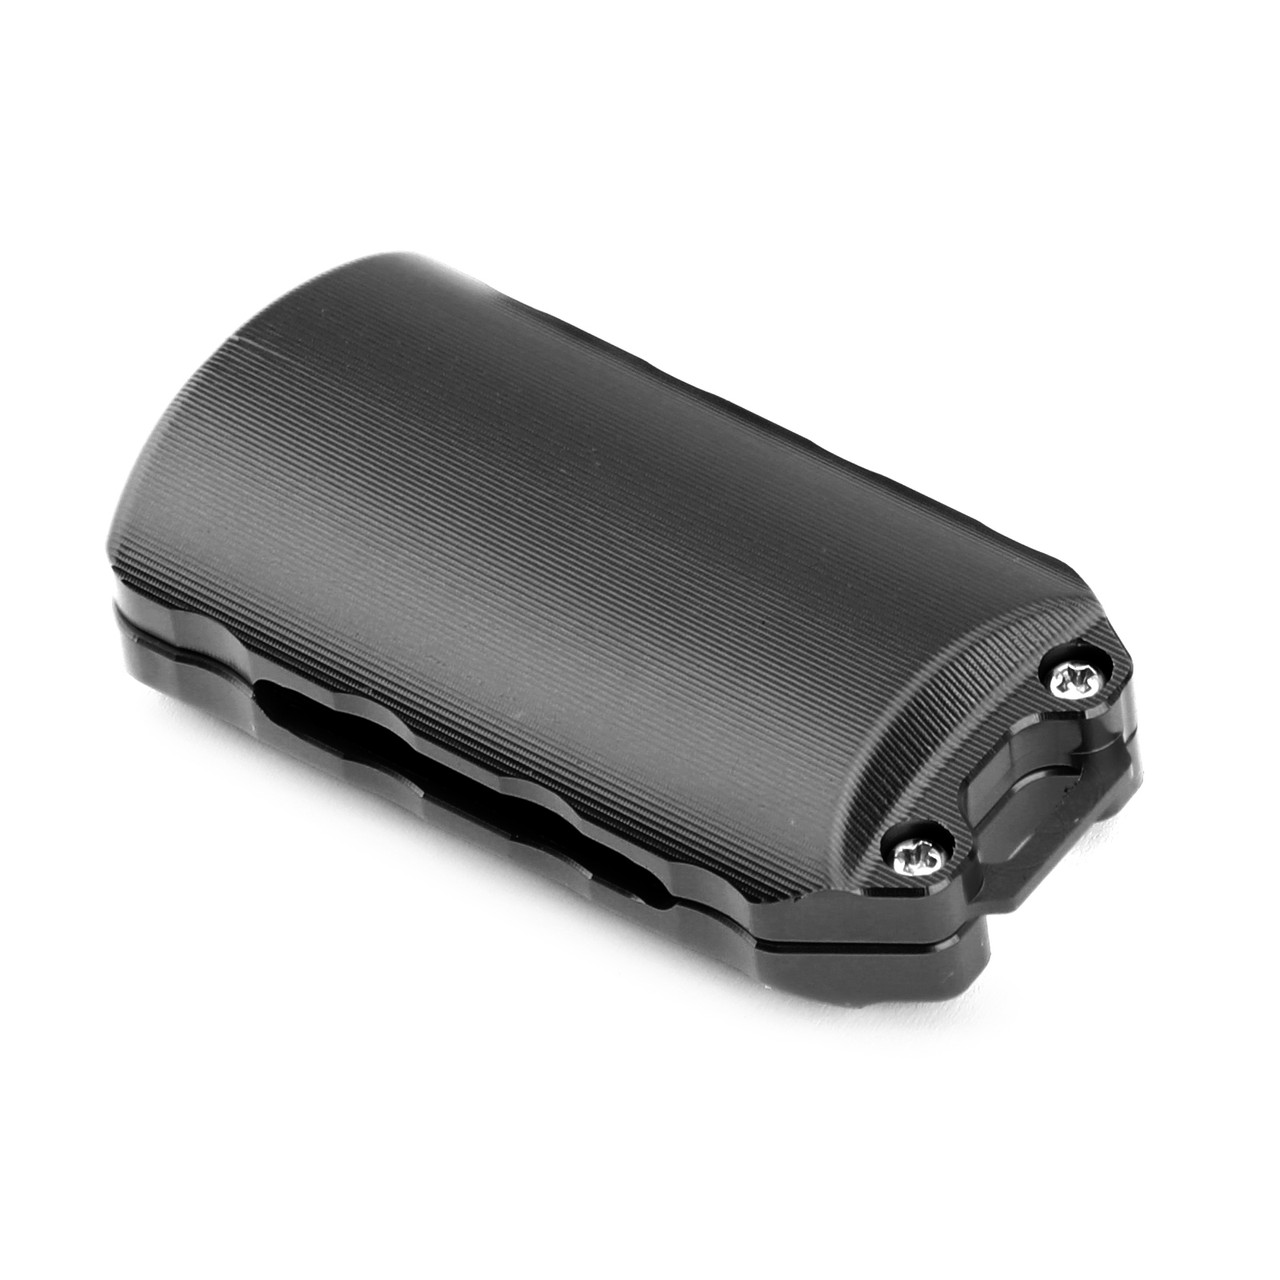 Key Case Cover Holder Protector For Yamaha NVX 155 AEROX 155 15-19 XMAX 125/250/300/400 17-19 Black